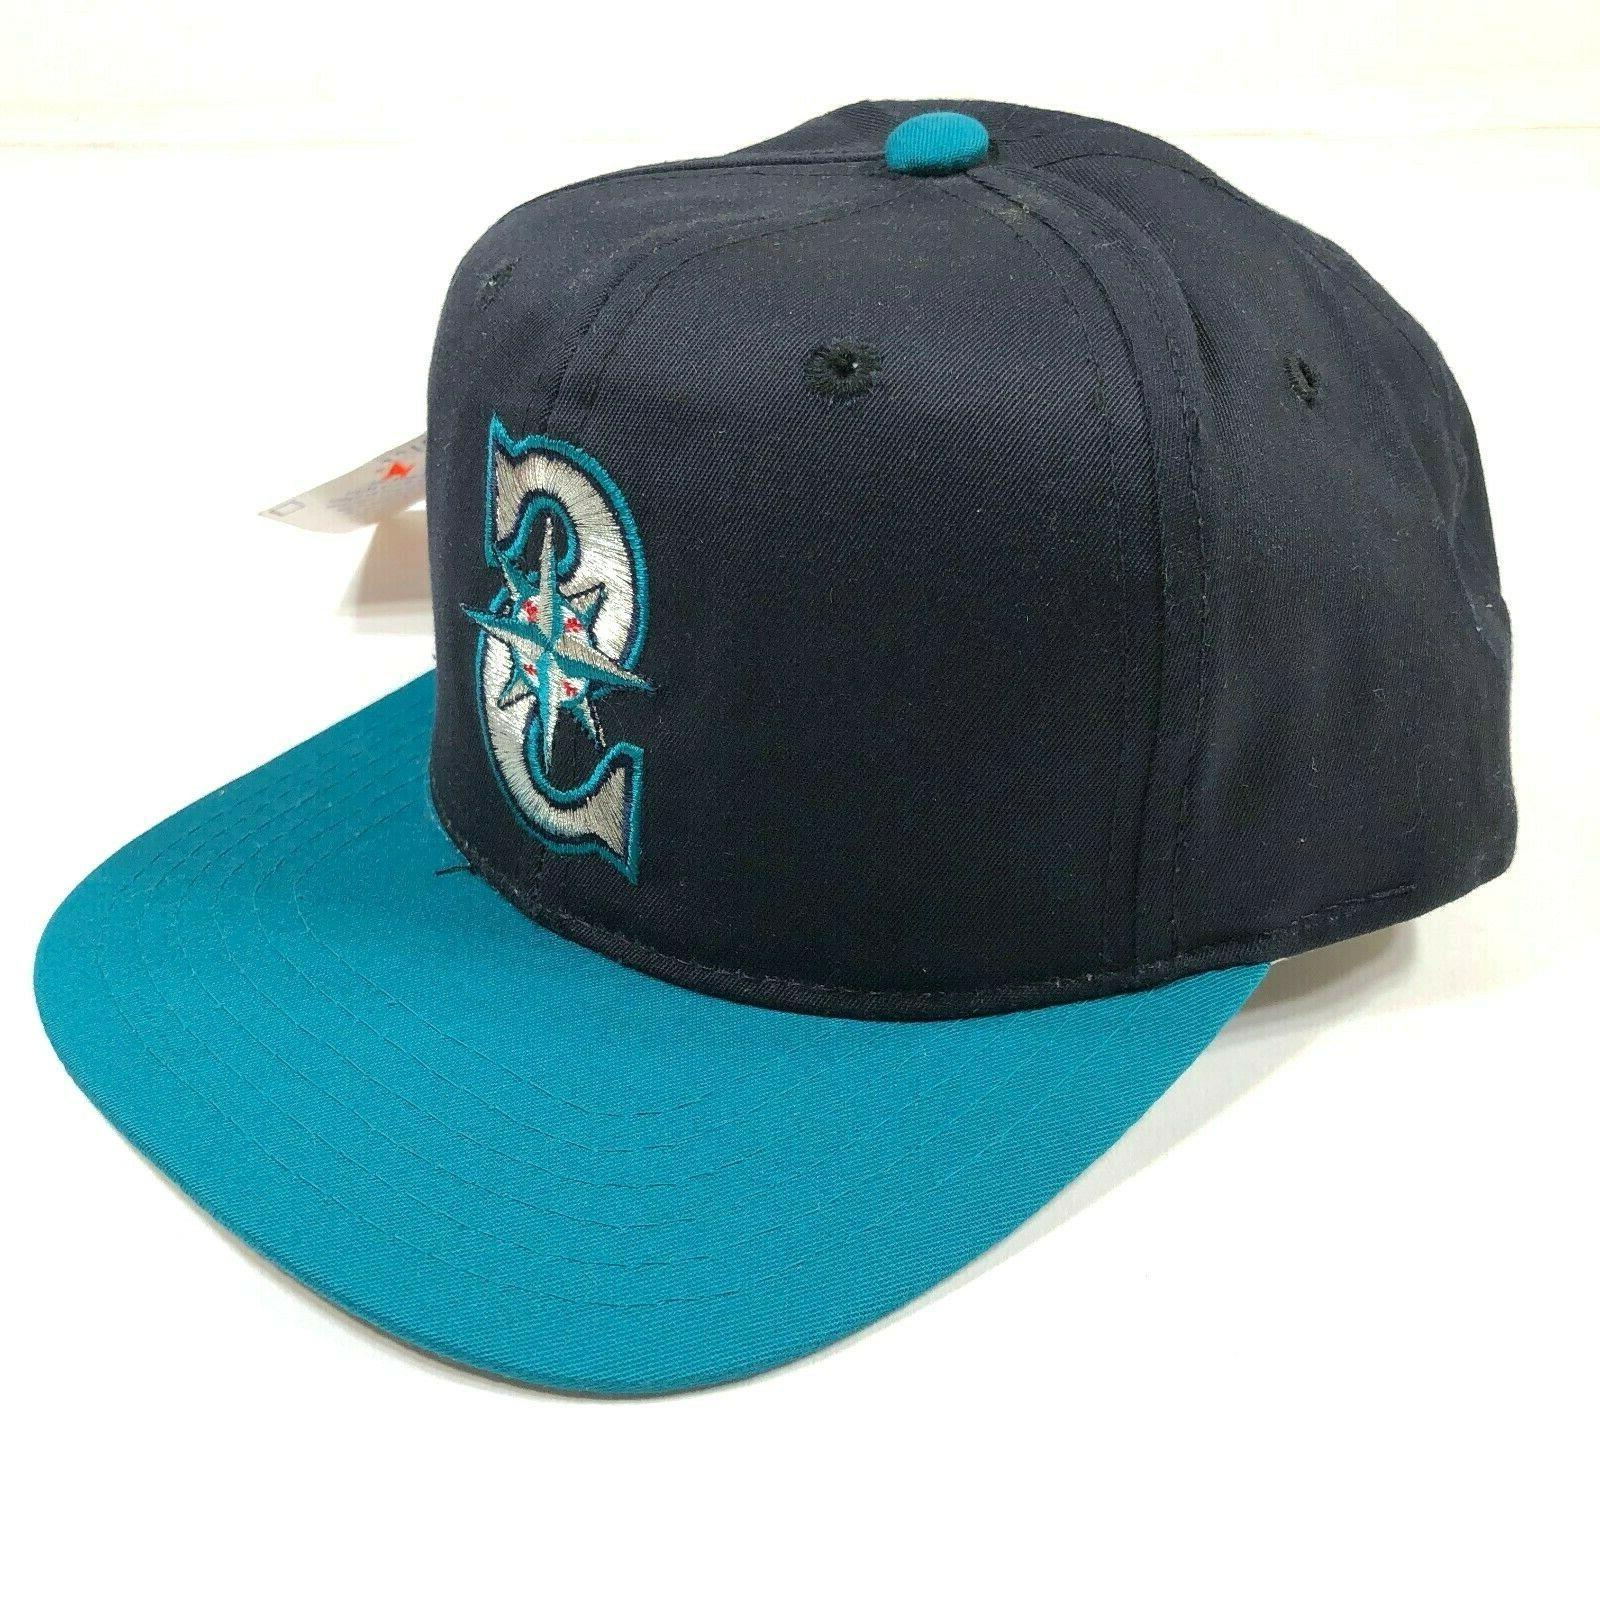 seattle mariners snapback hat cap navy blue